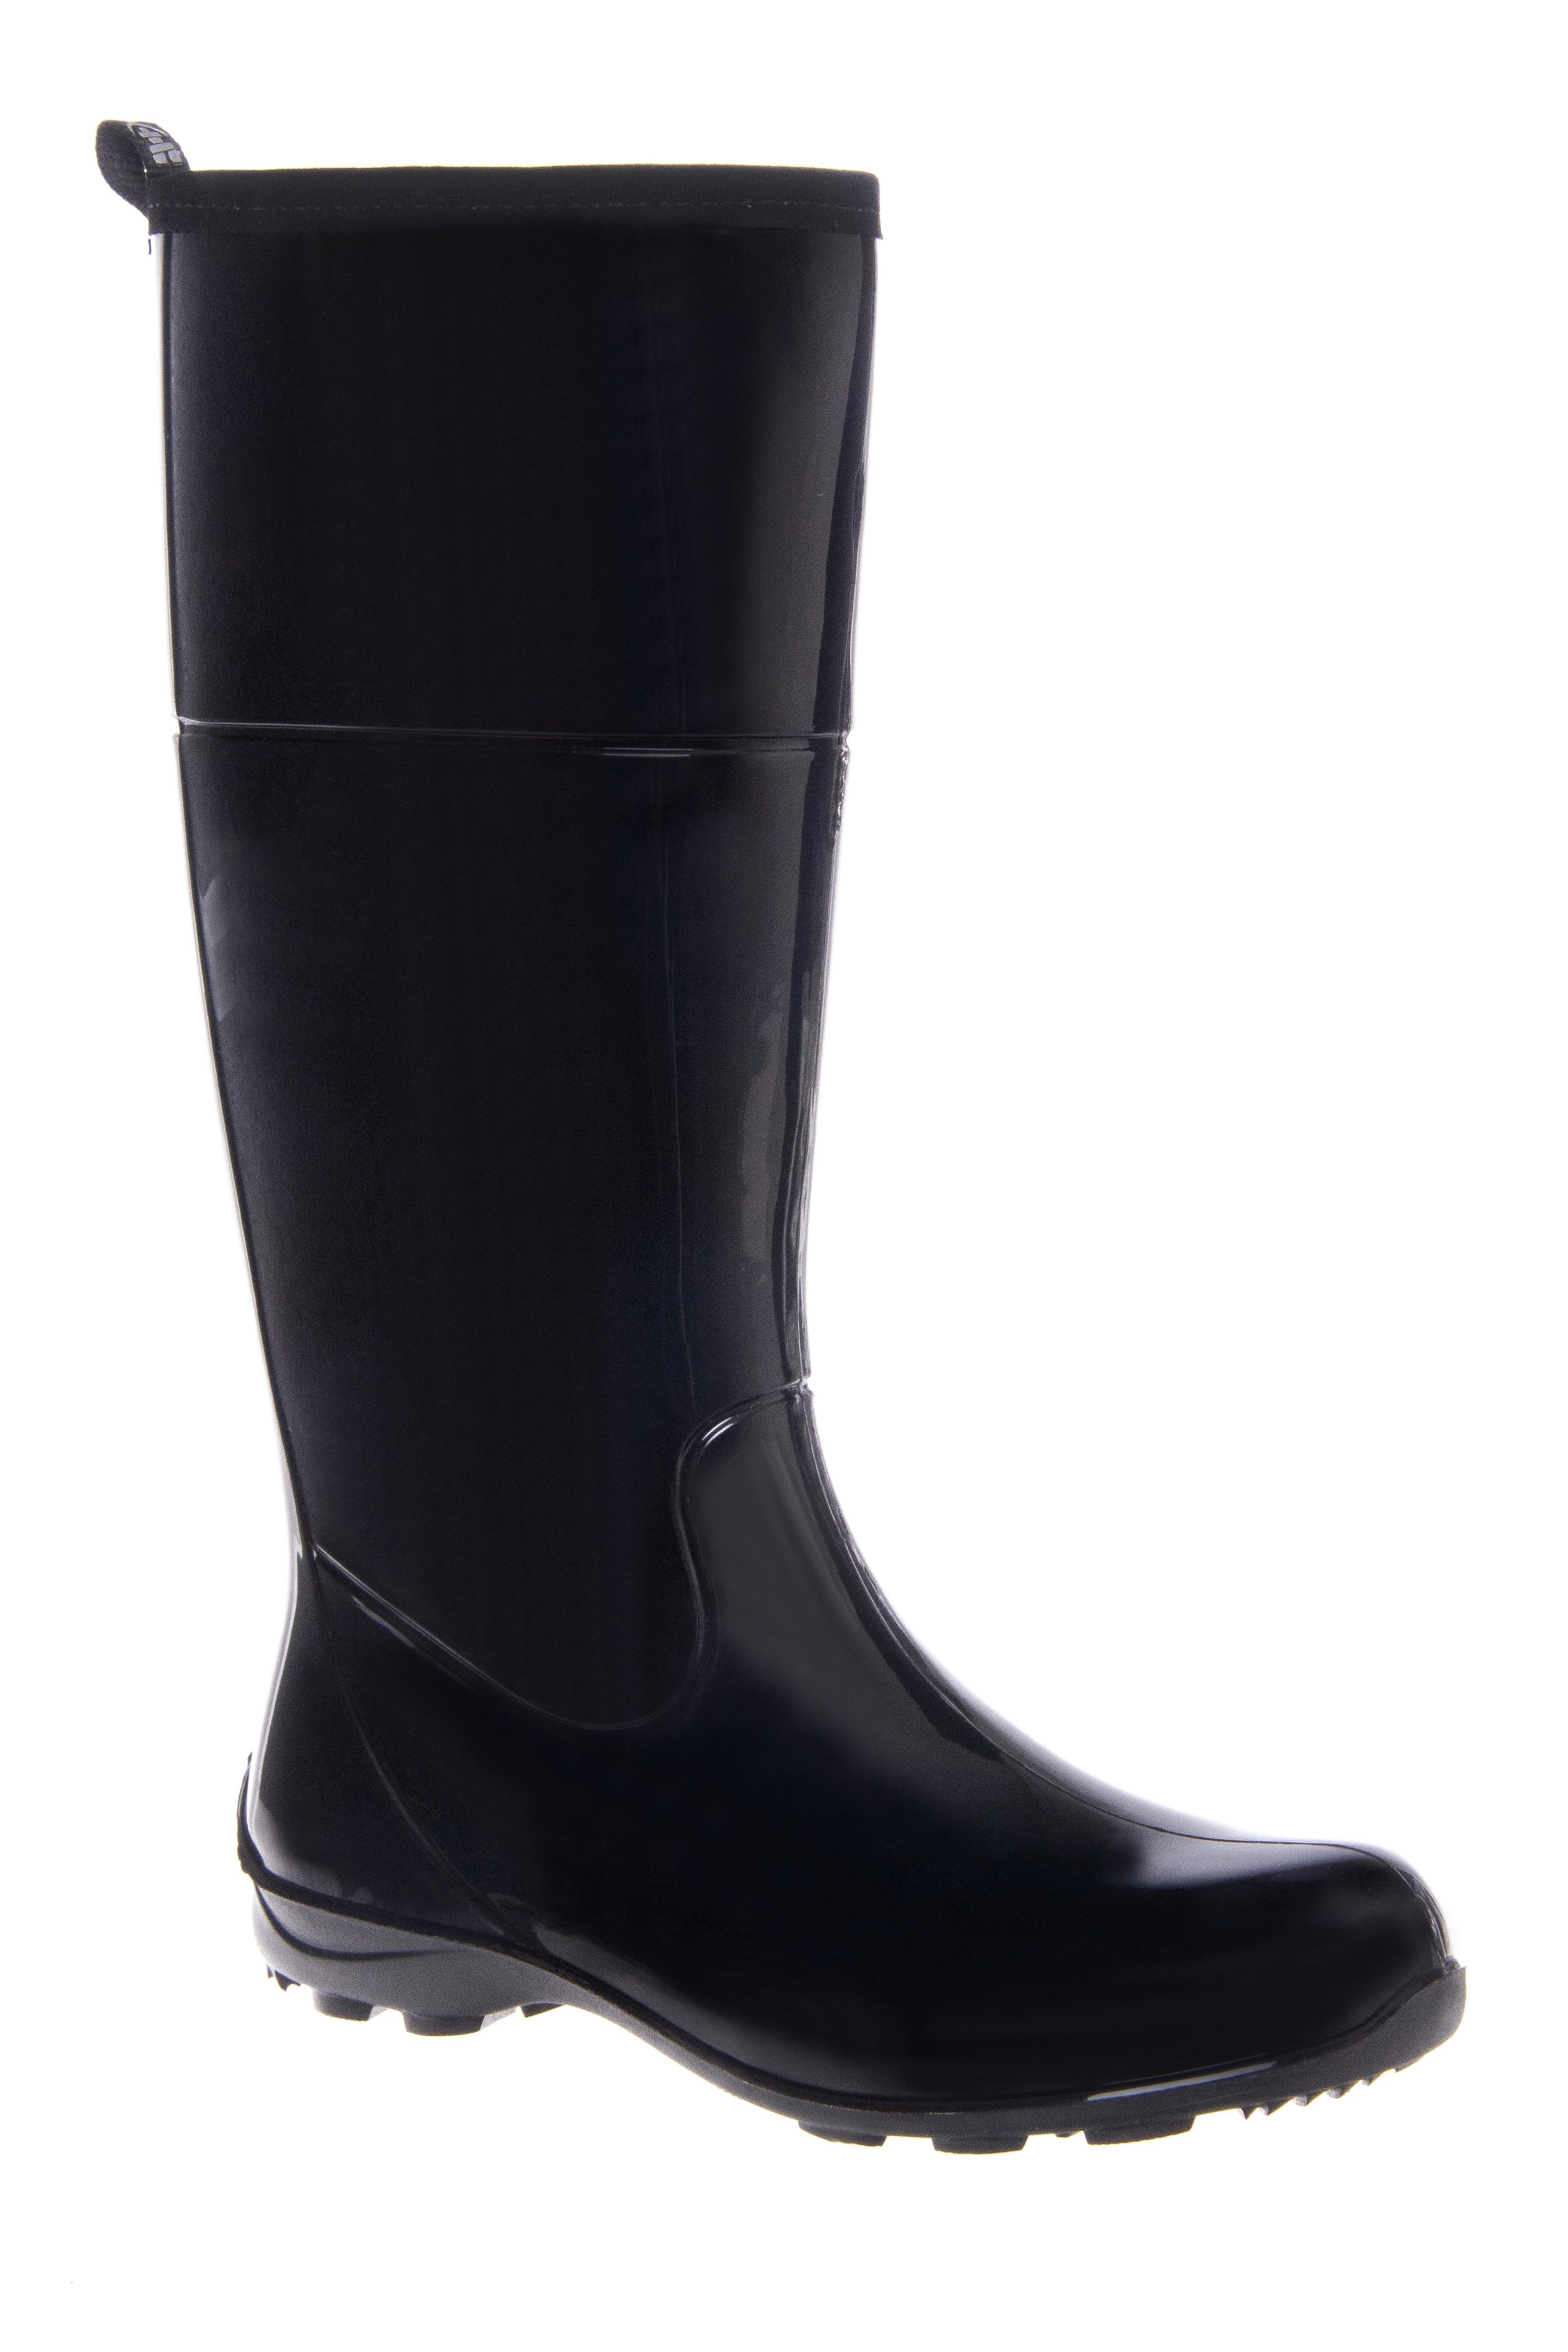 KAMIK Ellie Rain Boots - Black